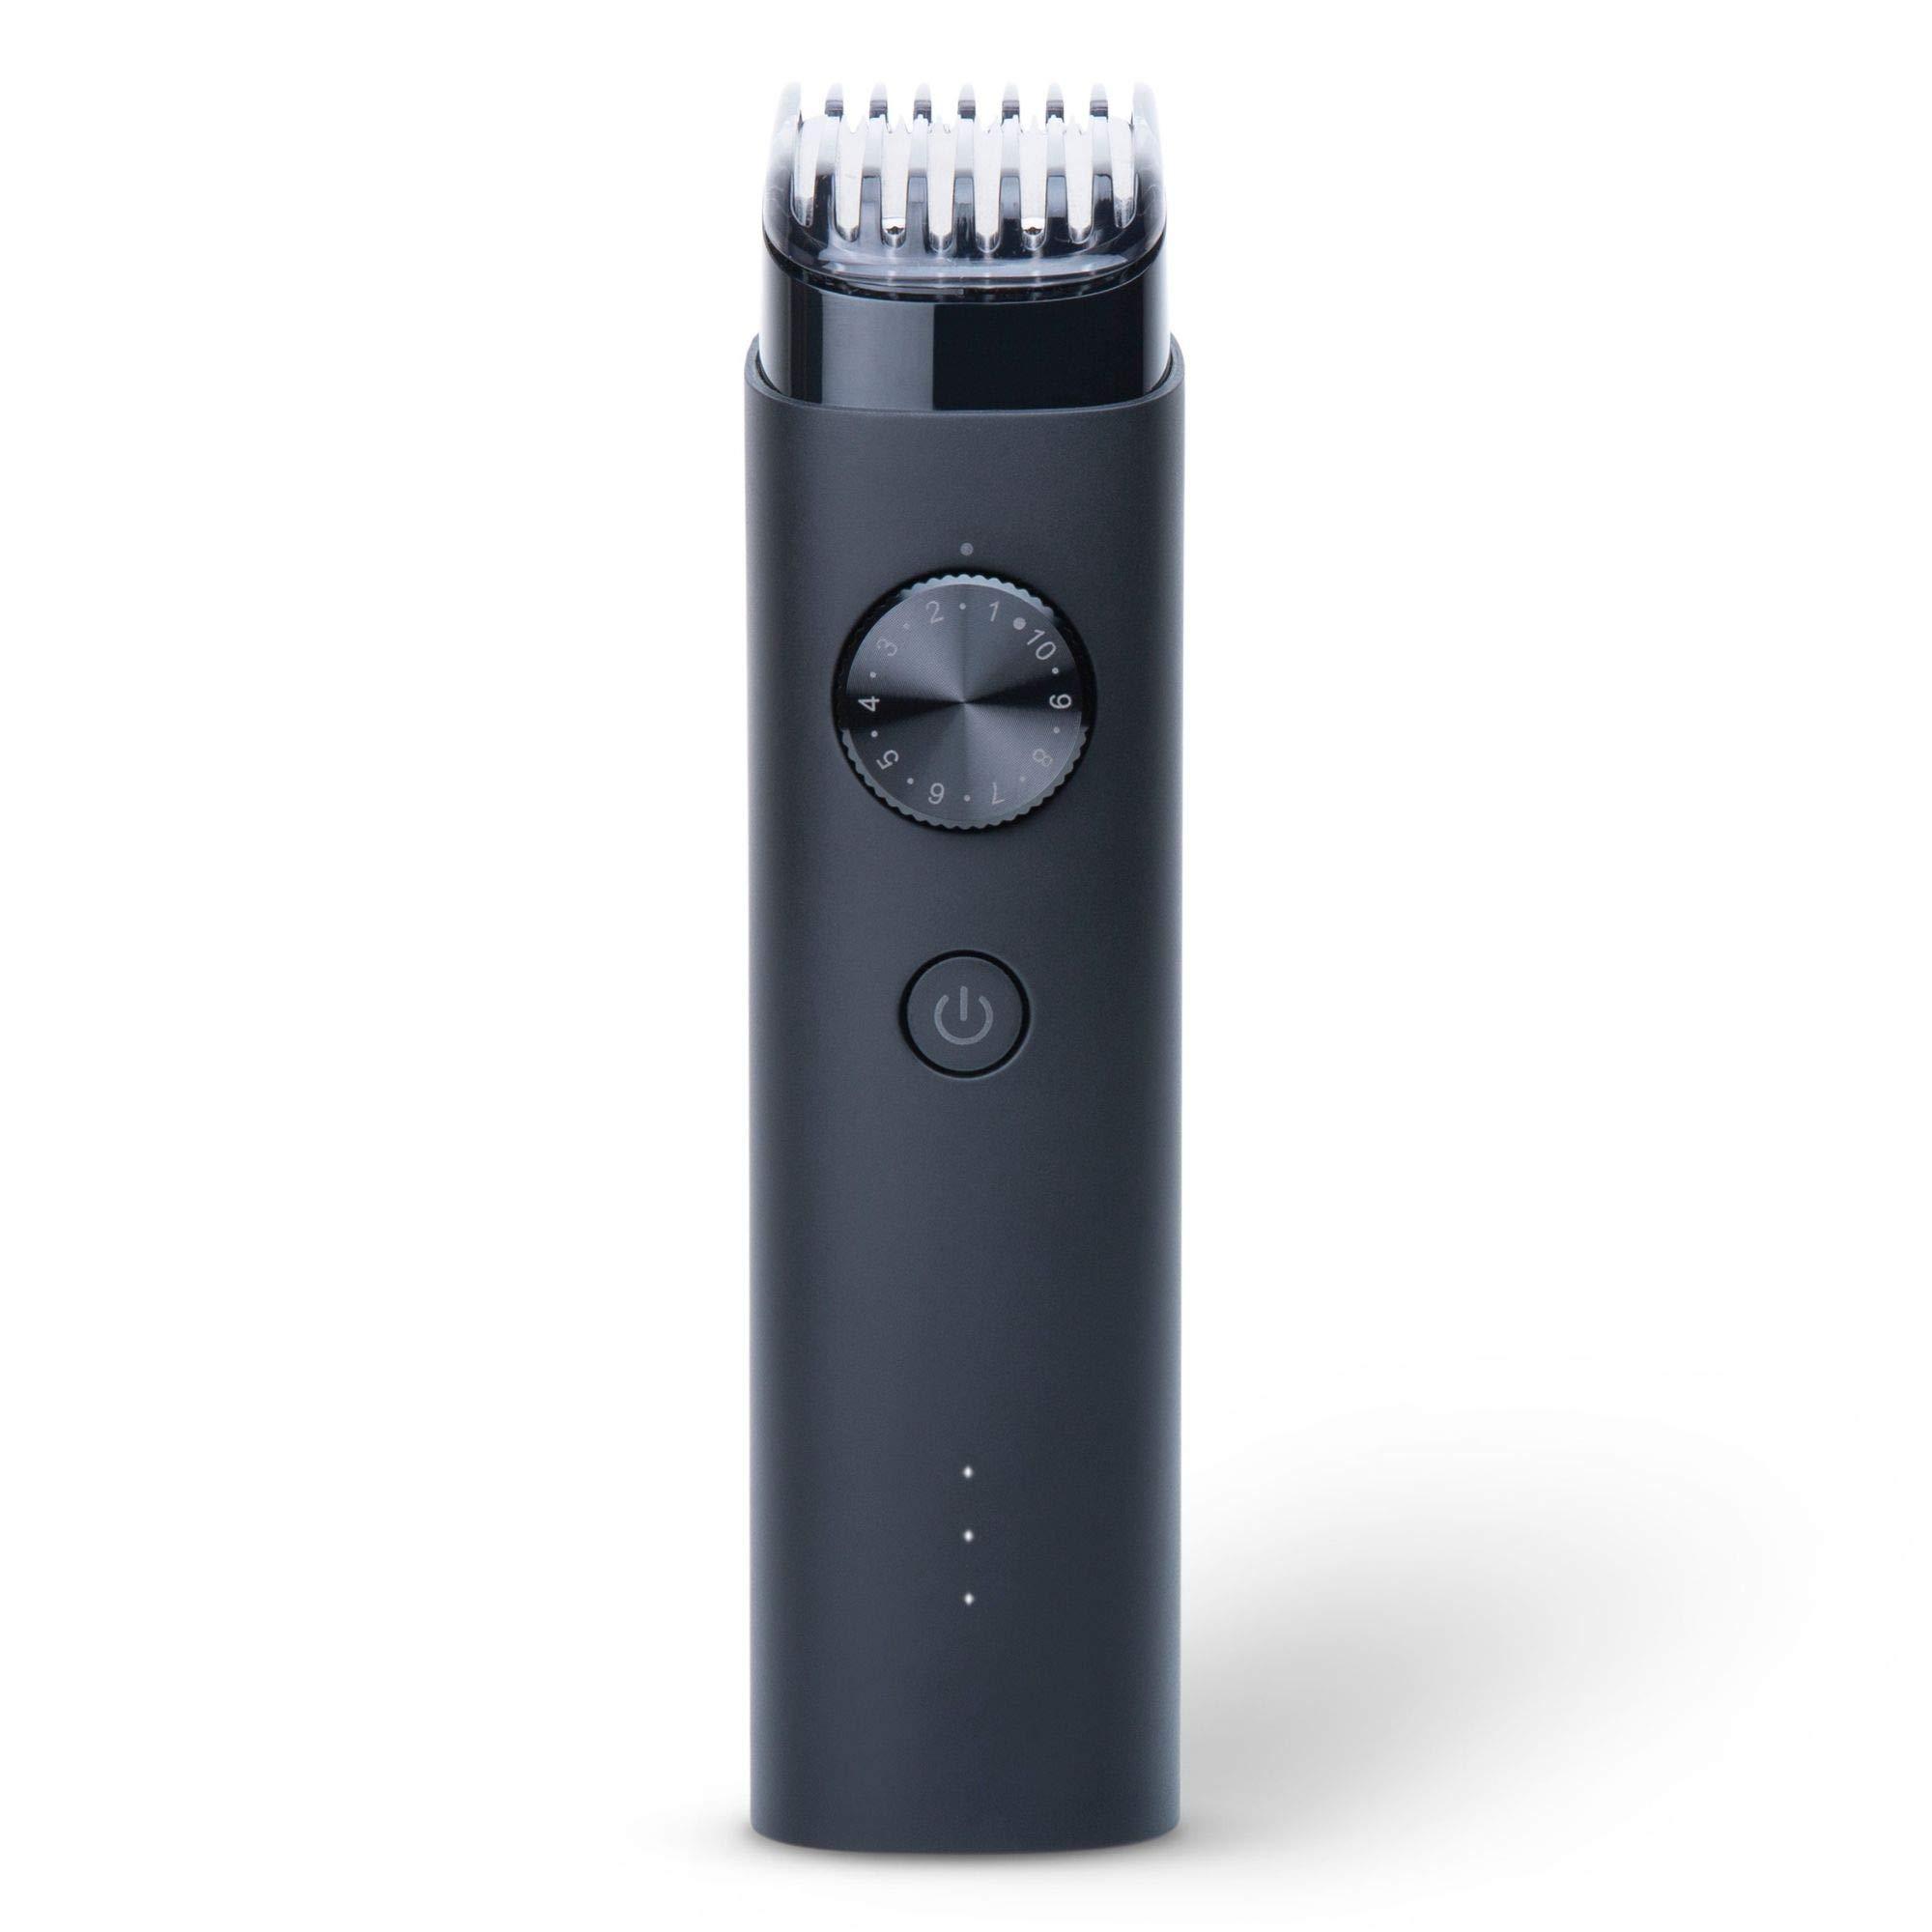 Mi Corded/Cordless Waterproof Beard Trimmer - 40 length settings product image